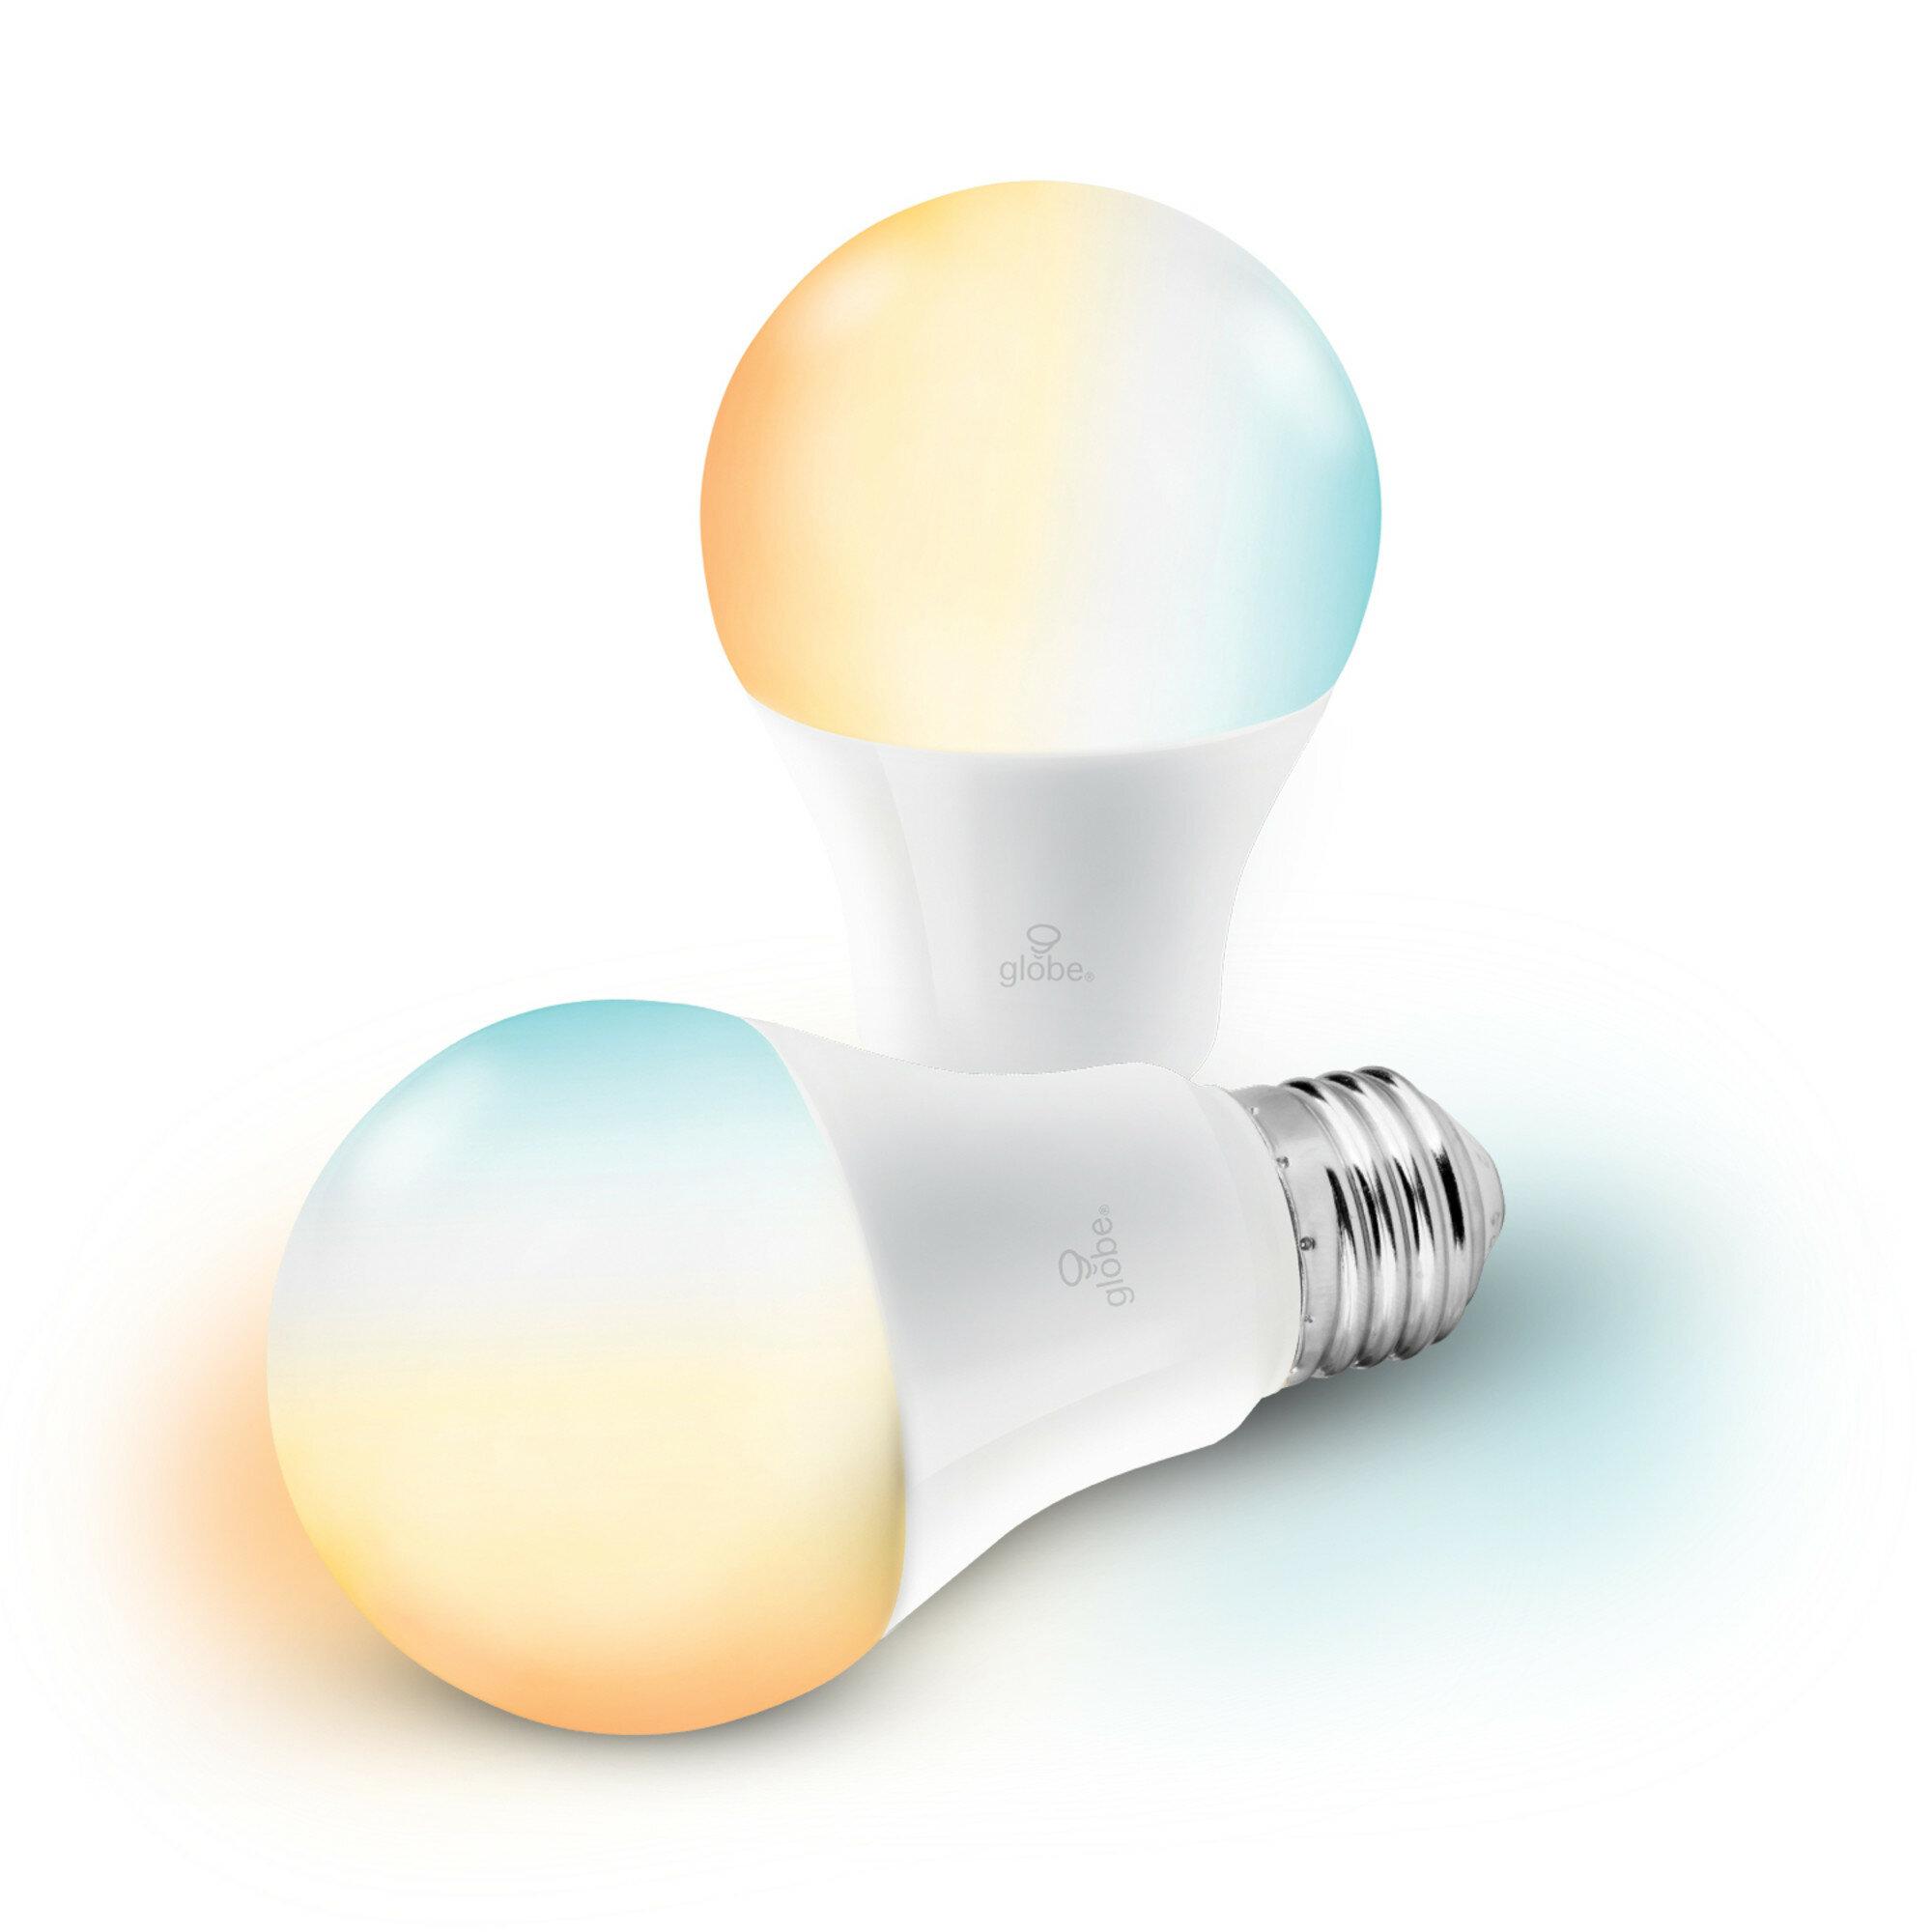 competitive price de6a4 ba603 10 Watt (60 Watt Equivalent), A19 LED Smart, Dimmable Light Bulb, Warm  White (3000K) E26/Medium (Standard) Base